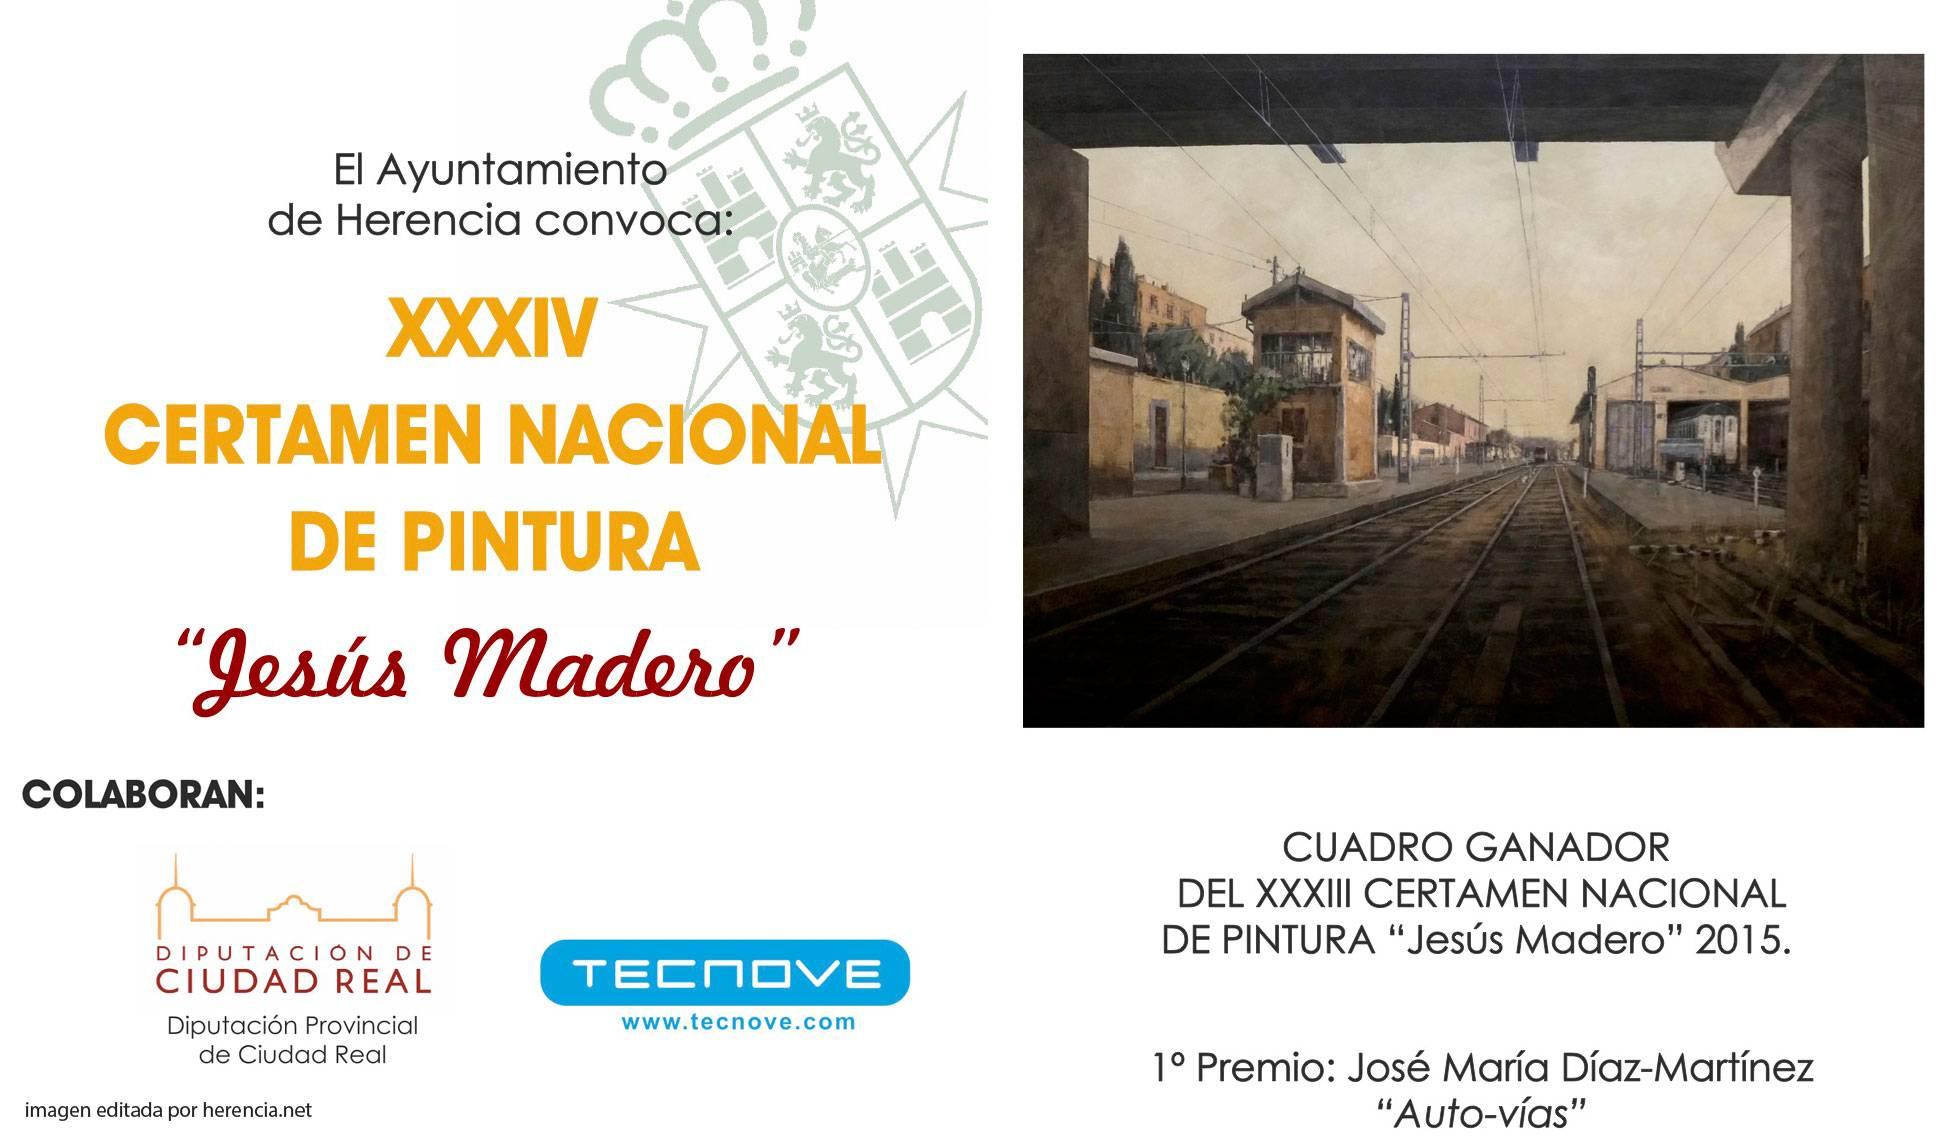 XXXIV-certamen-nacional-de-pintura-Jesus-Madero